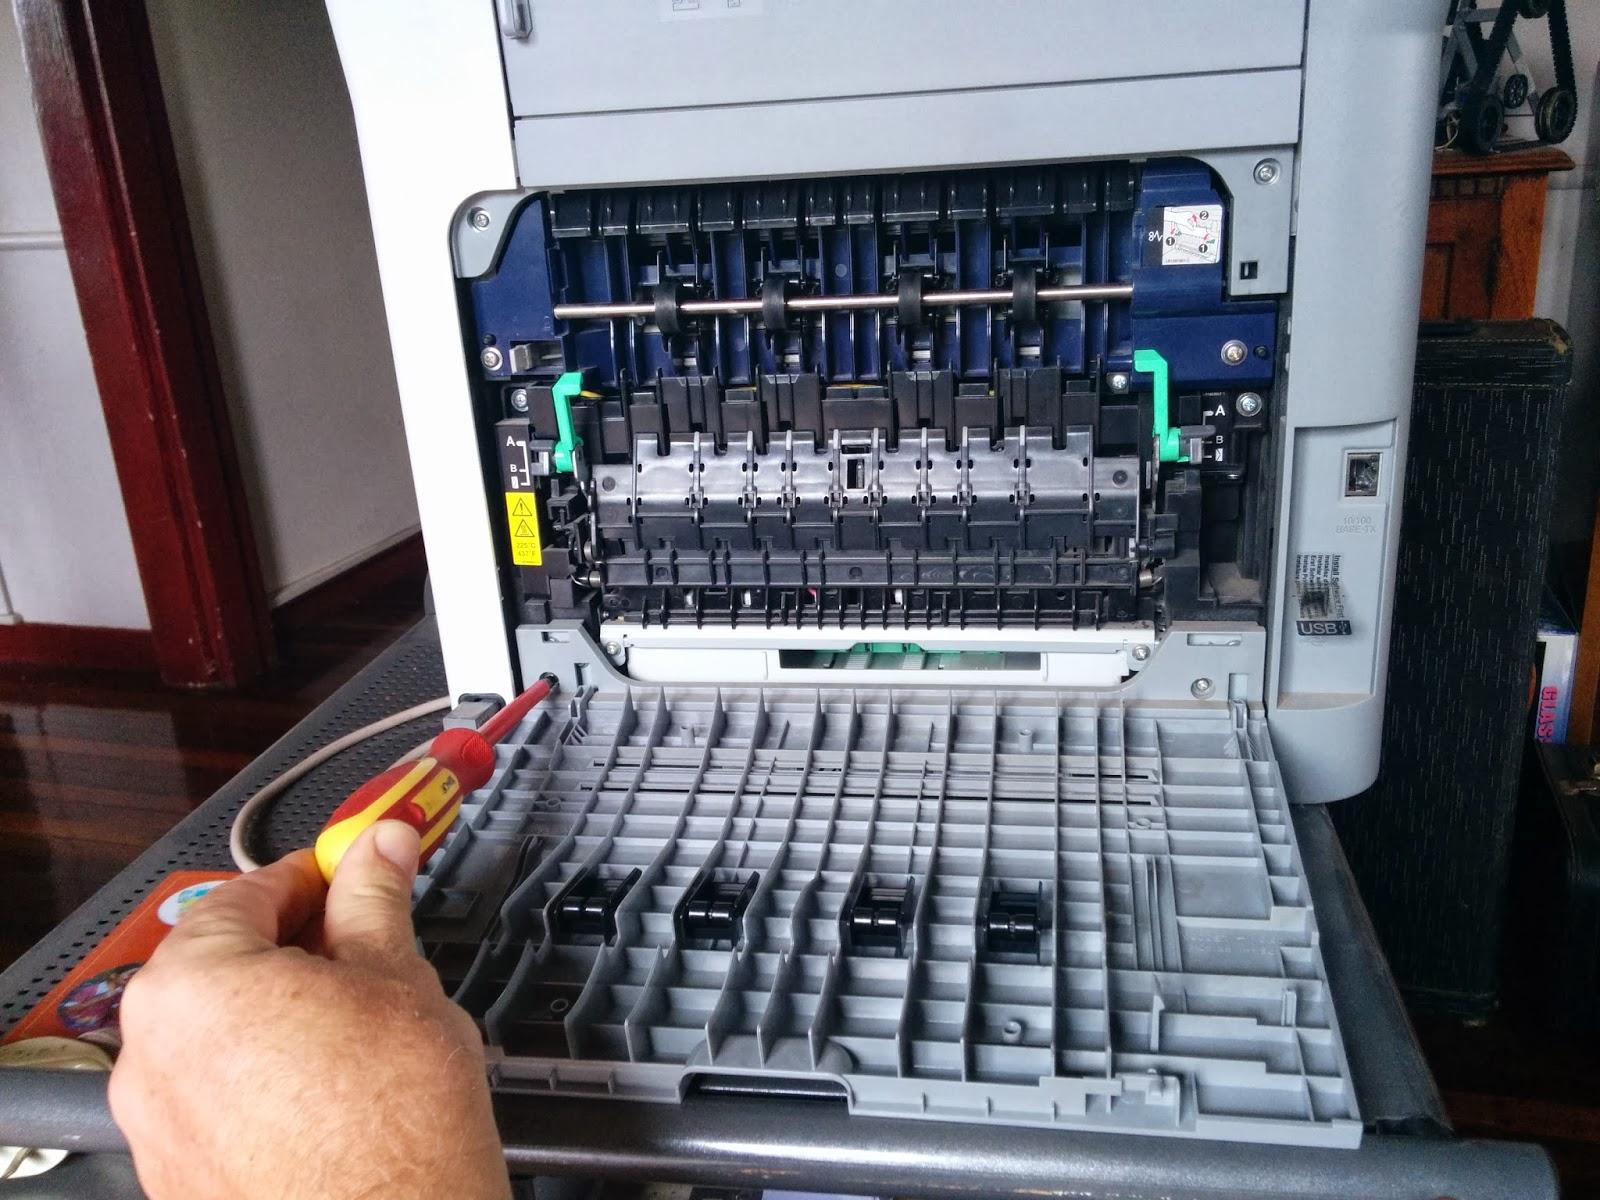 how to fix brother printer error 48